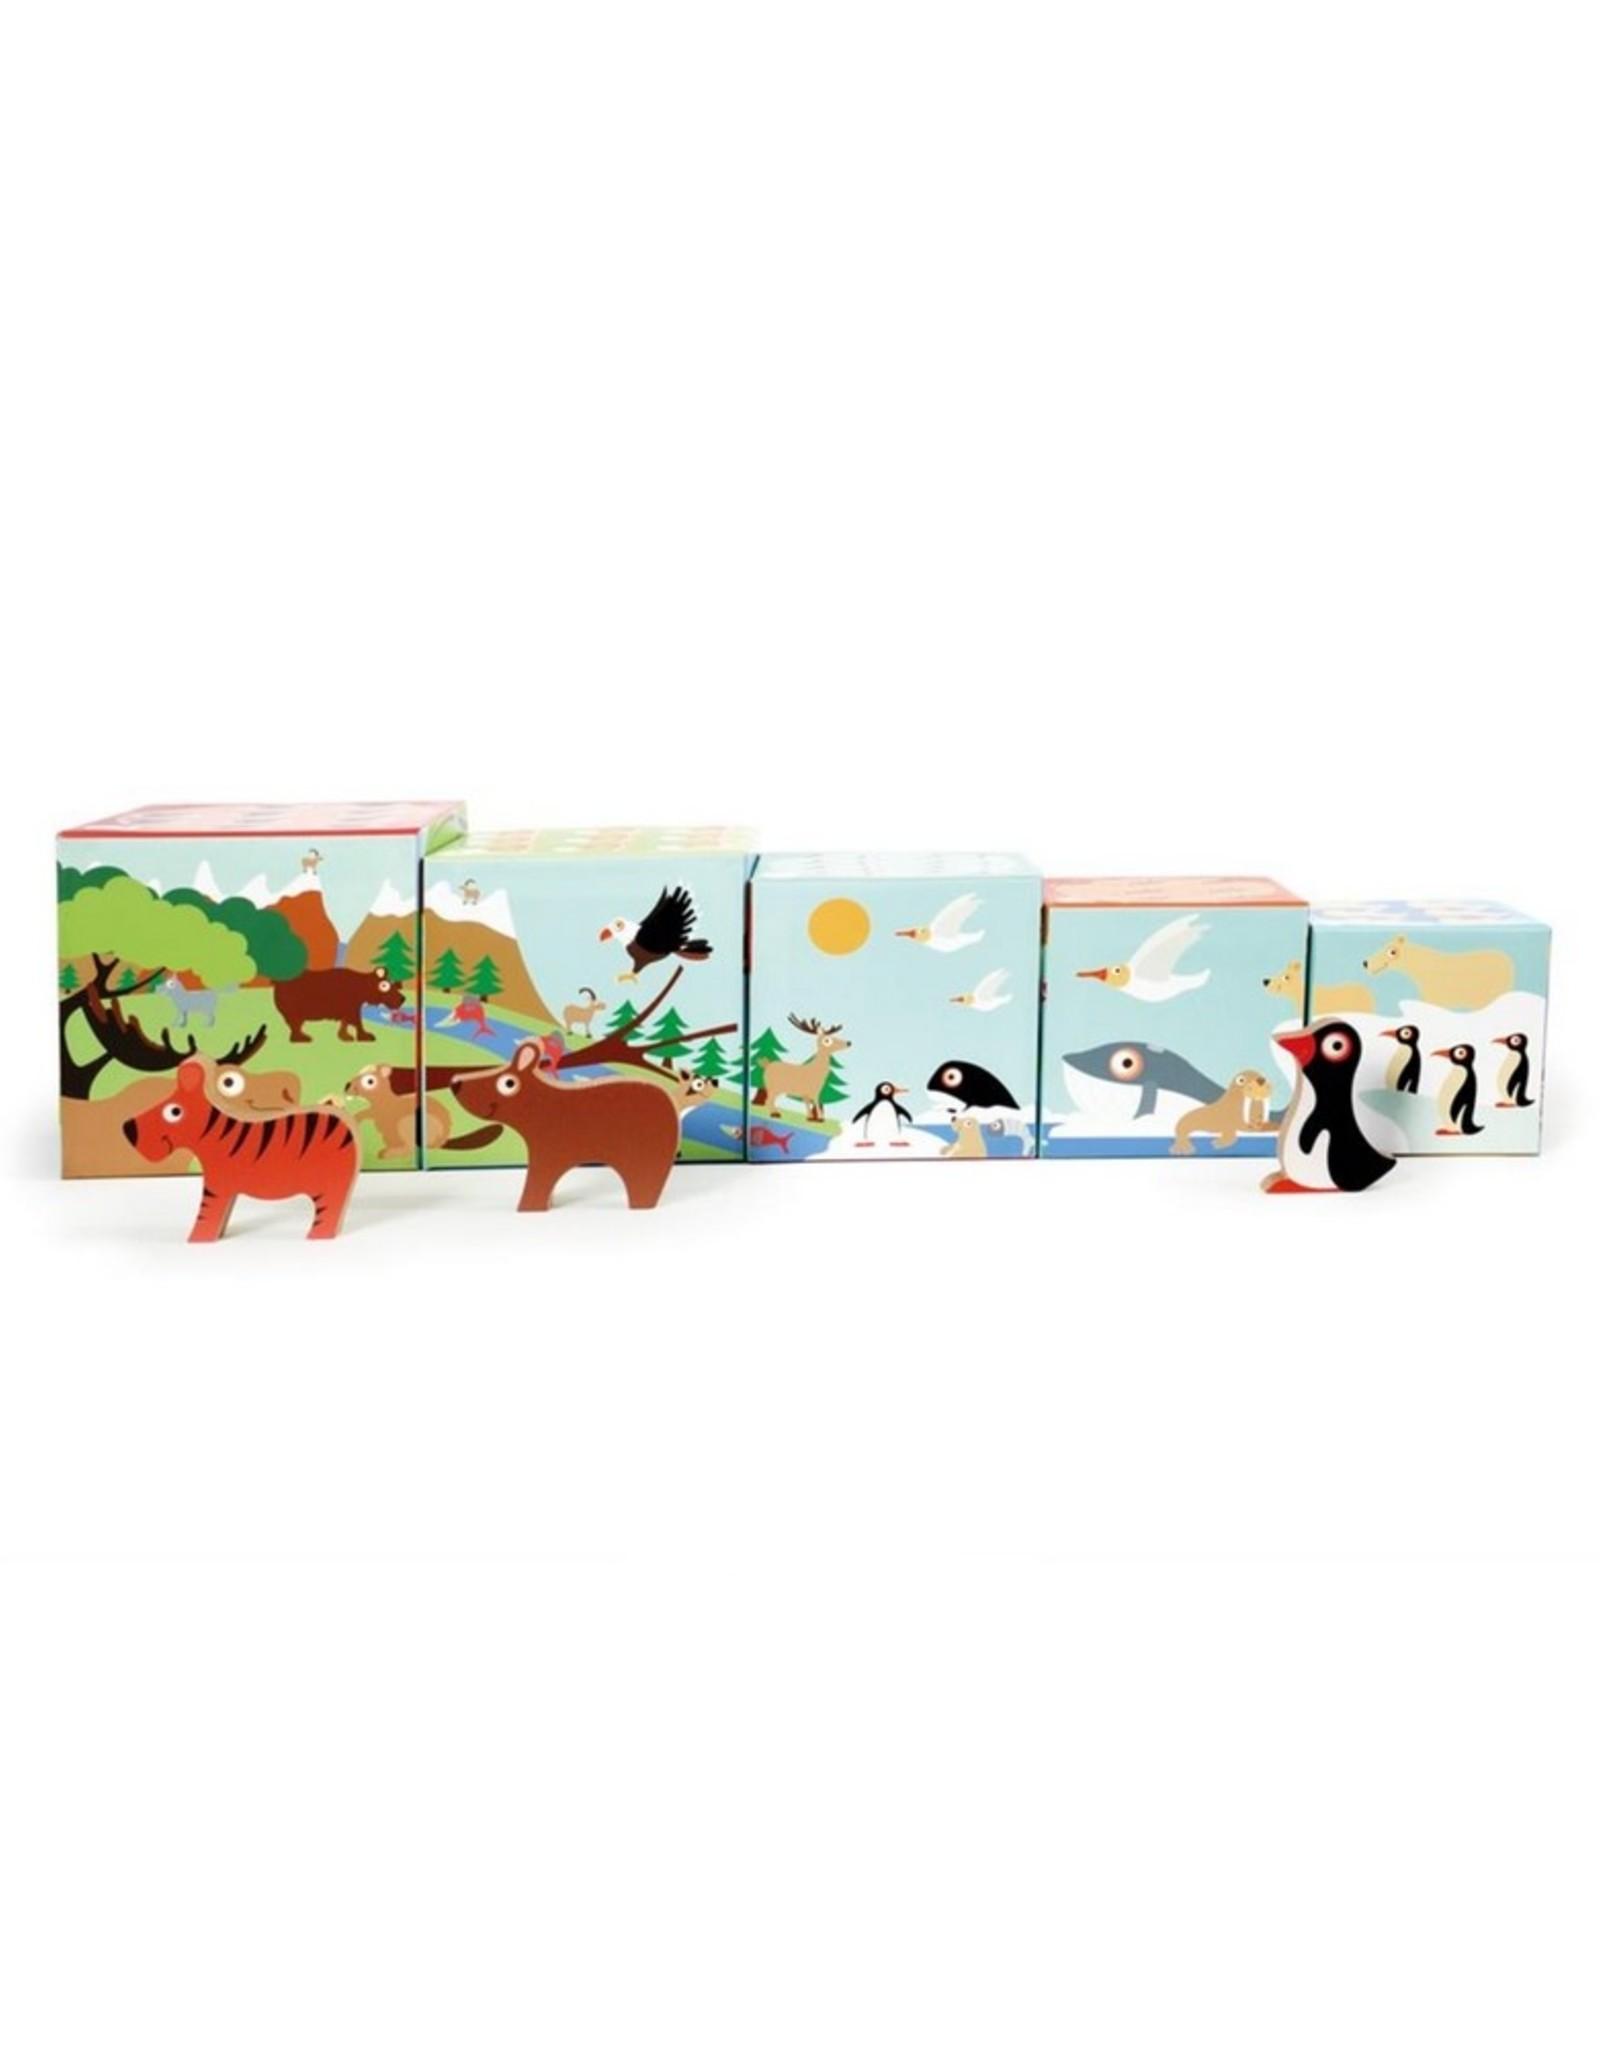 Scratch Europe Stapeltoren Dieren incl. 3 houten dieren